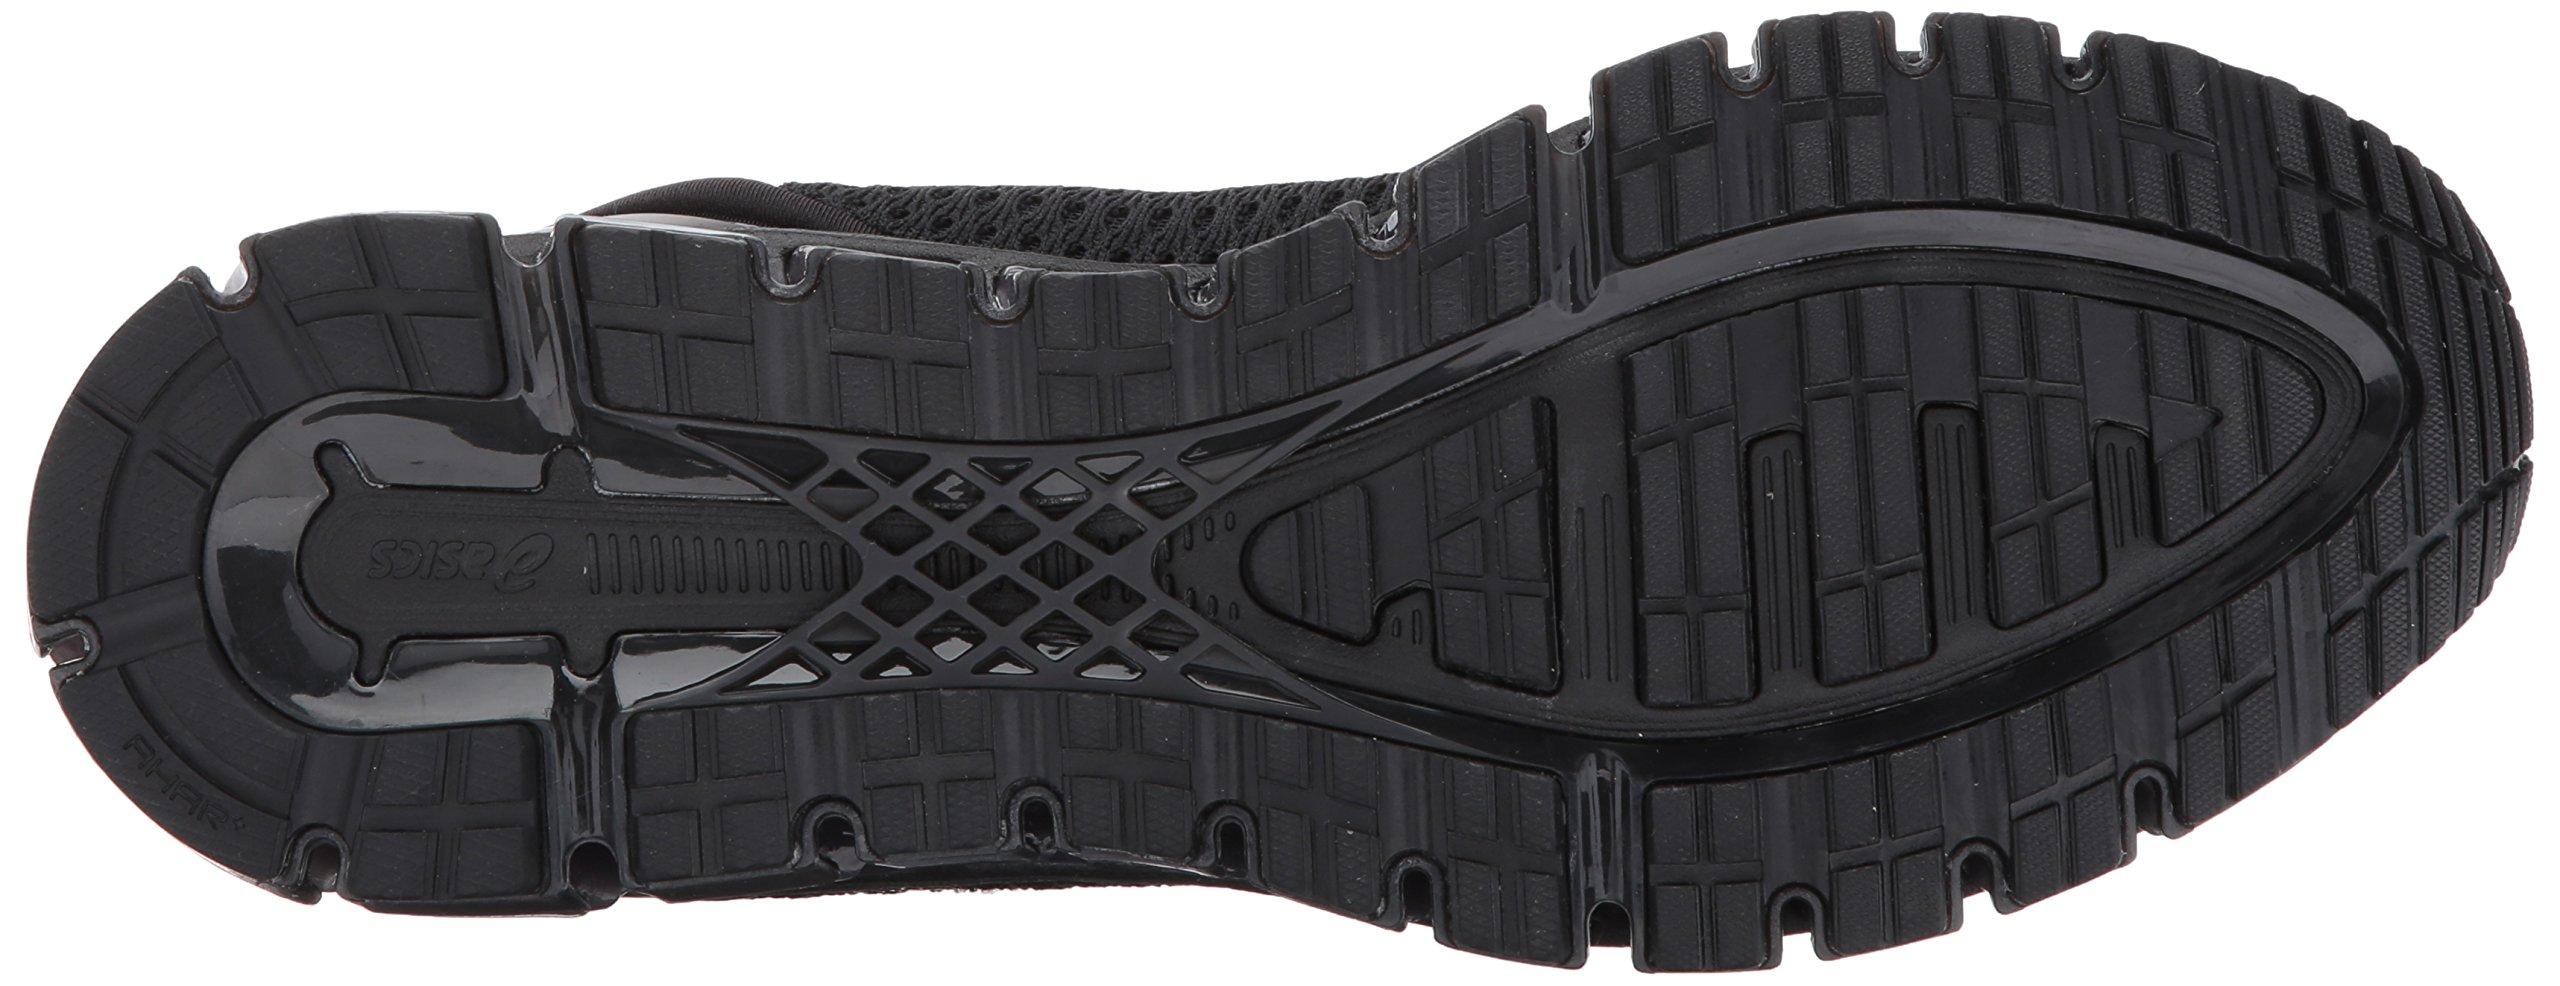 hot sales 70a1c 368c6 ASICS Mens Gel-Quantum 360 Shift Running Shoe, Black, 10.5 Medium US - T7E2N .9090-00009-10.5 Medium US   Sports   Fitness Features   Sports   Outdoors  - ...